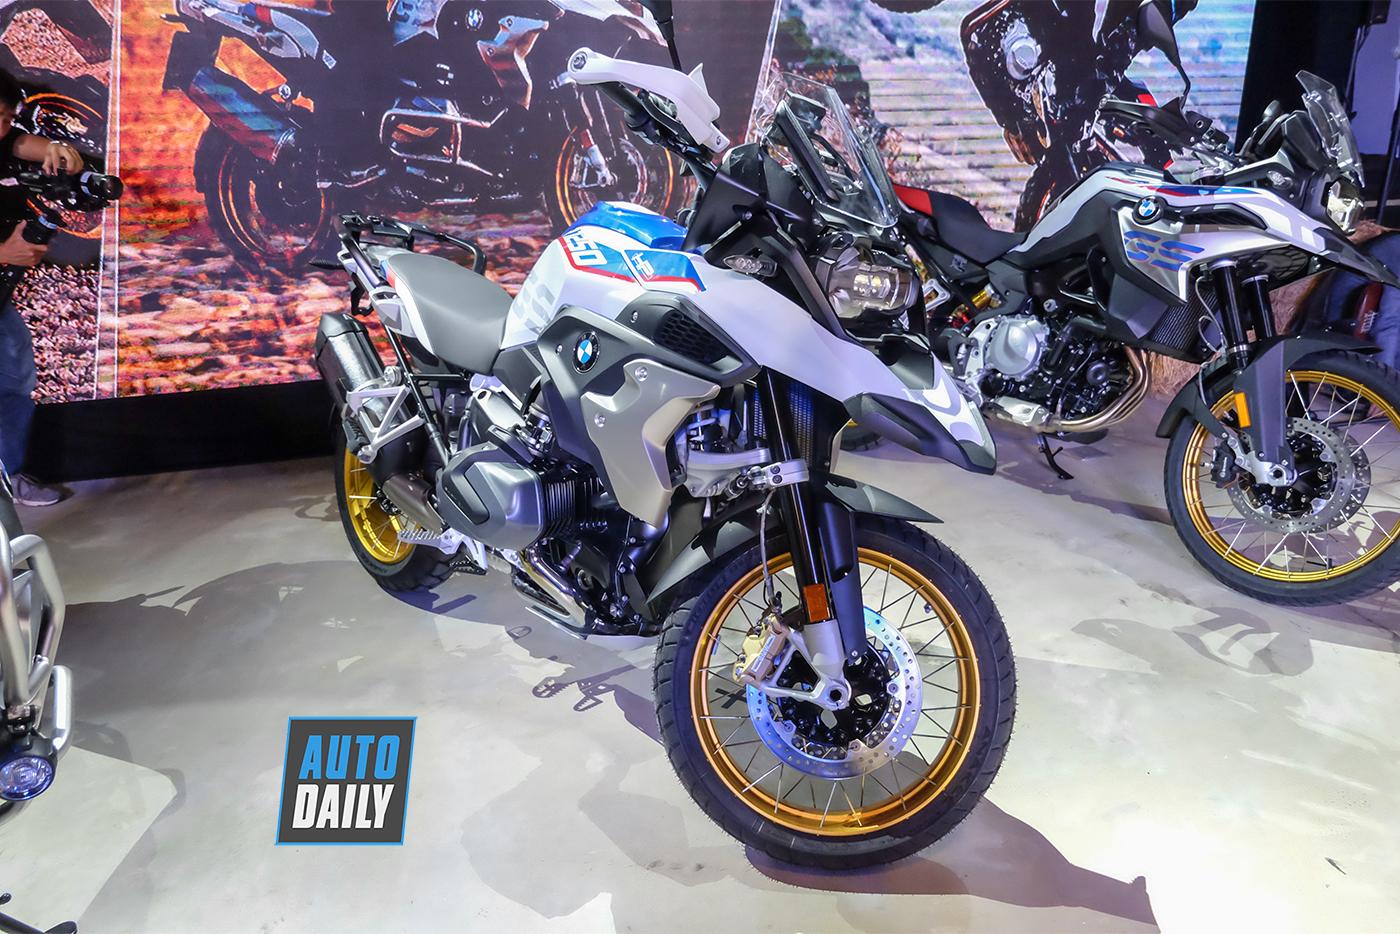 bmw-motorrad-r-1250-gs-2019-11.jpg